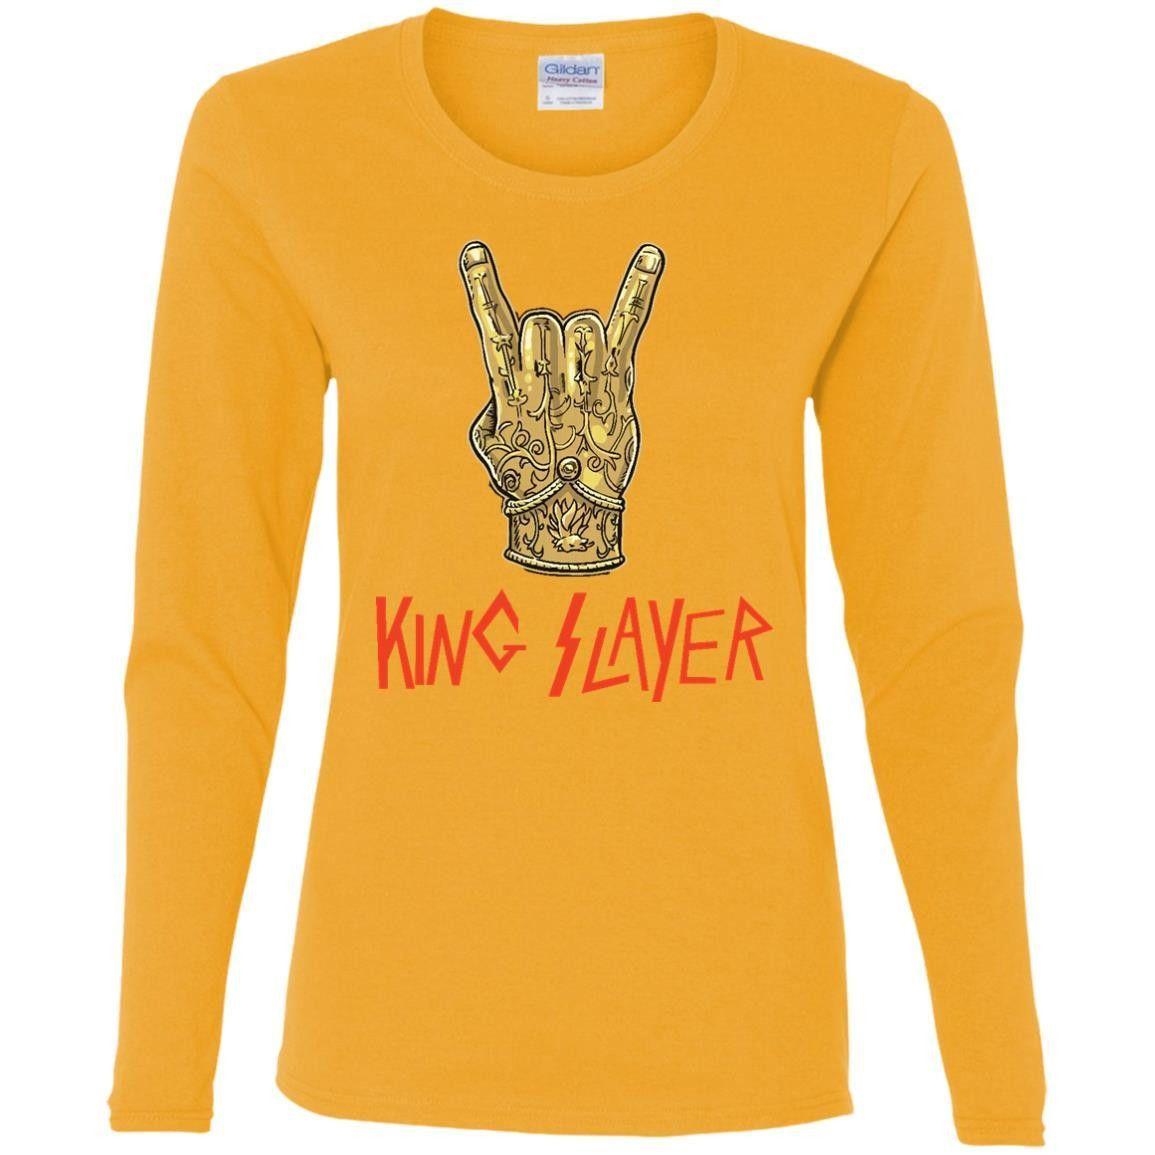 King Man Slayer T-Shirt G540L Gildan Ladies' Cotton LS T-Shirt